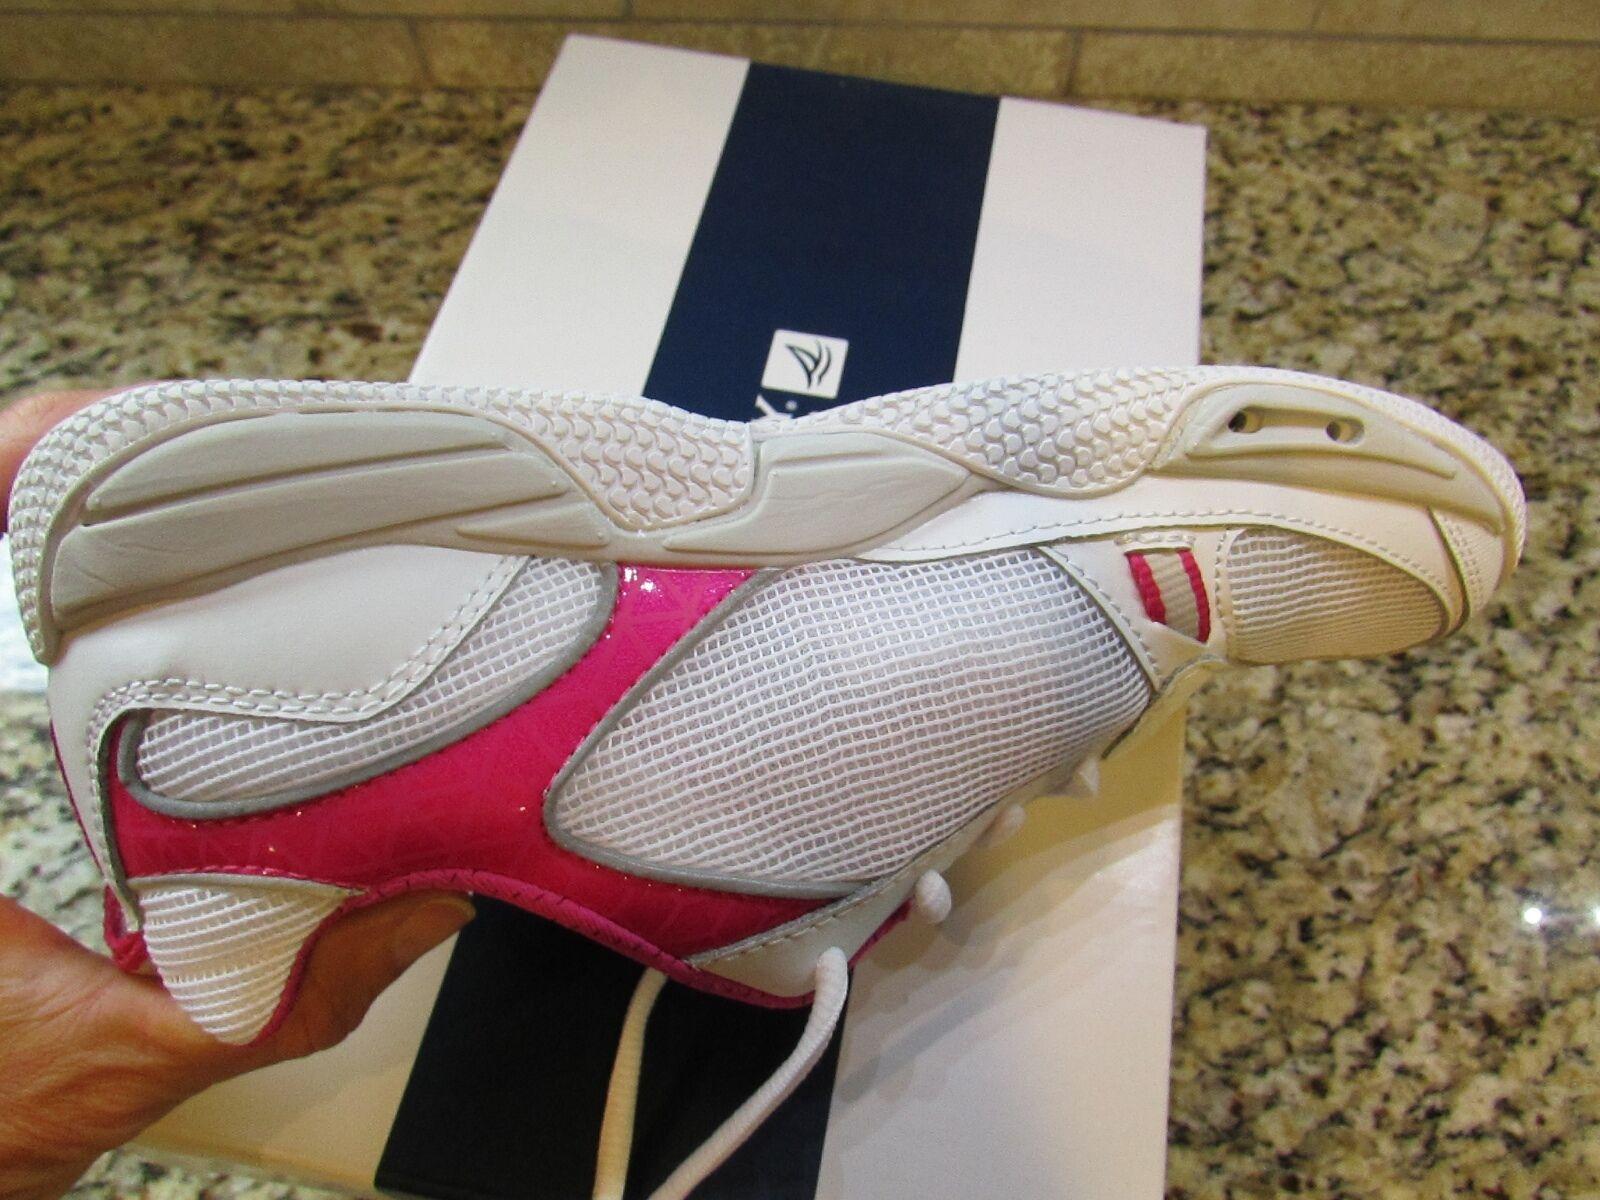 NEWS SPERRY TOP-SIDER SEA KITE ATHLETIC Schuhe Damenschuhe 9 9 9 Weiß PINK  FREE SHIP 3ddf7b